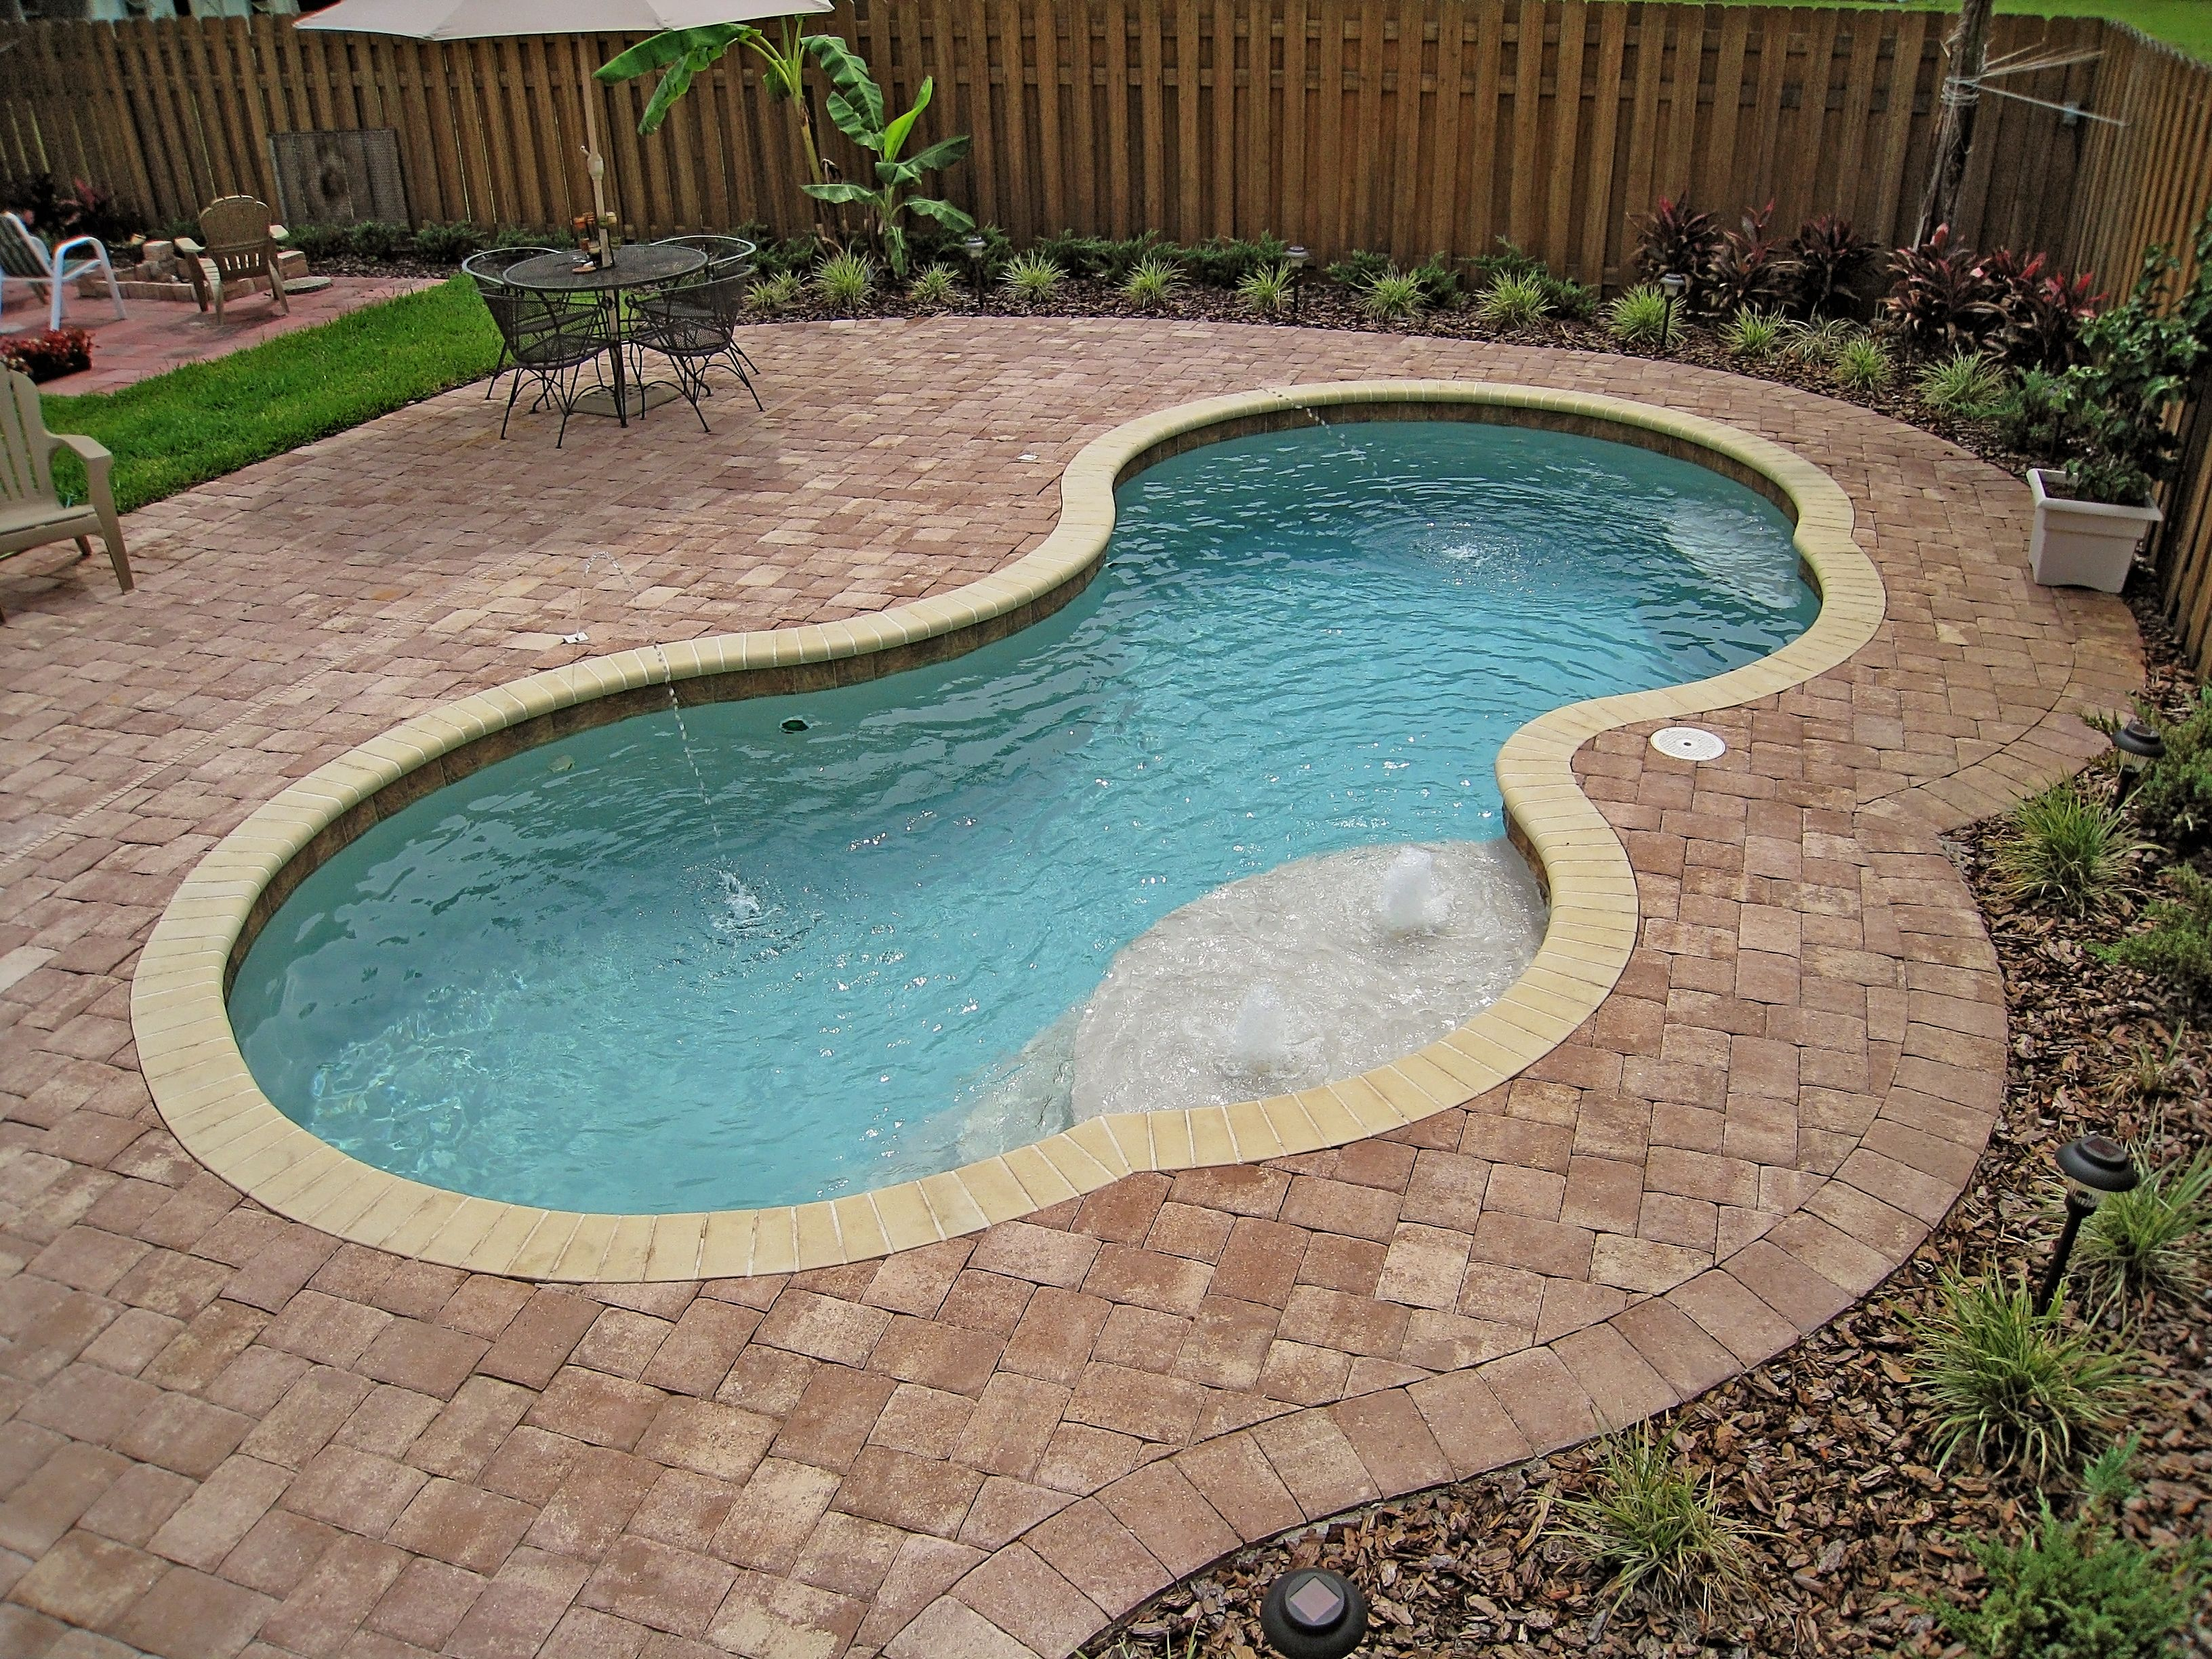 Chattanooga Fiberglass Pool - Picasso   Fiberglass Pools ...